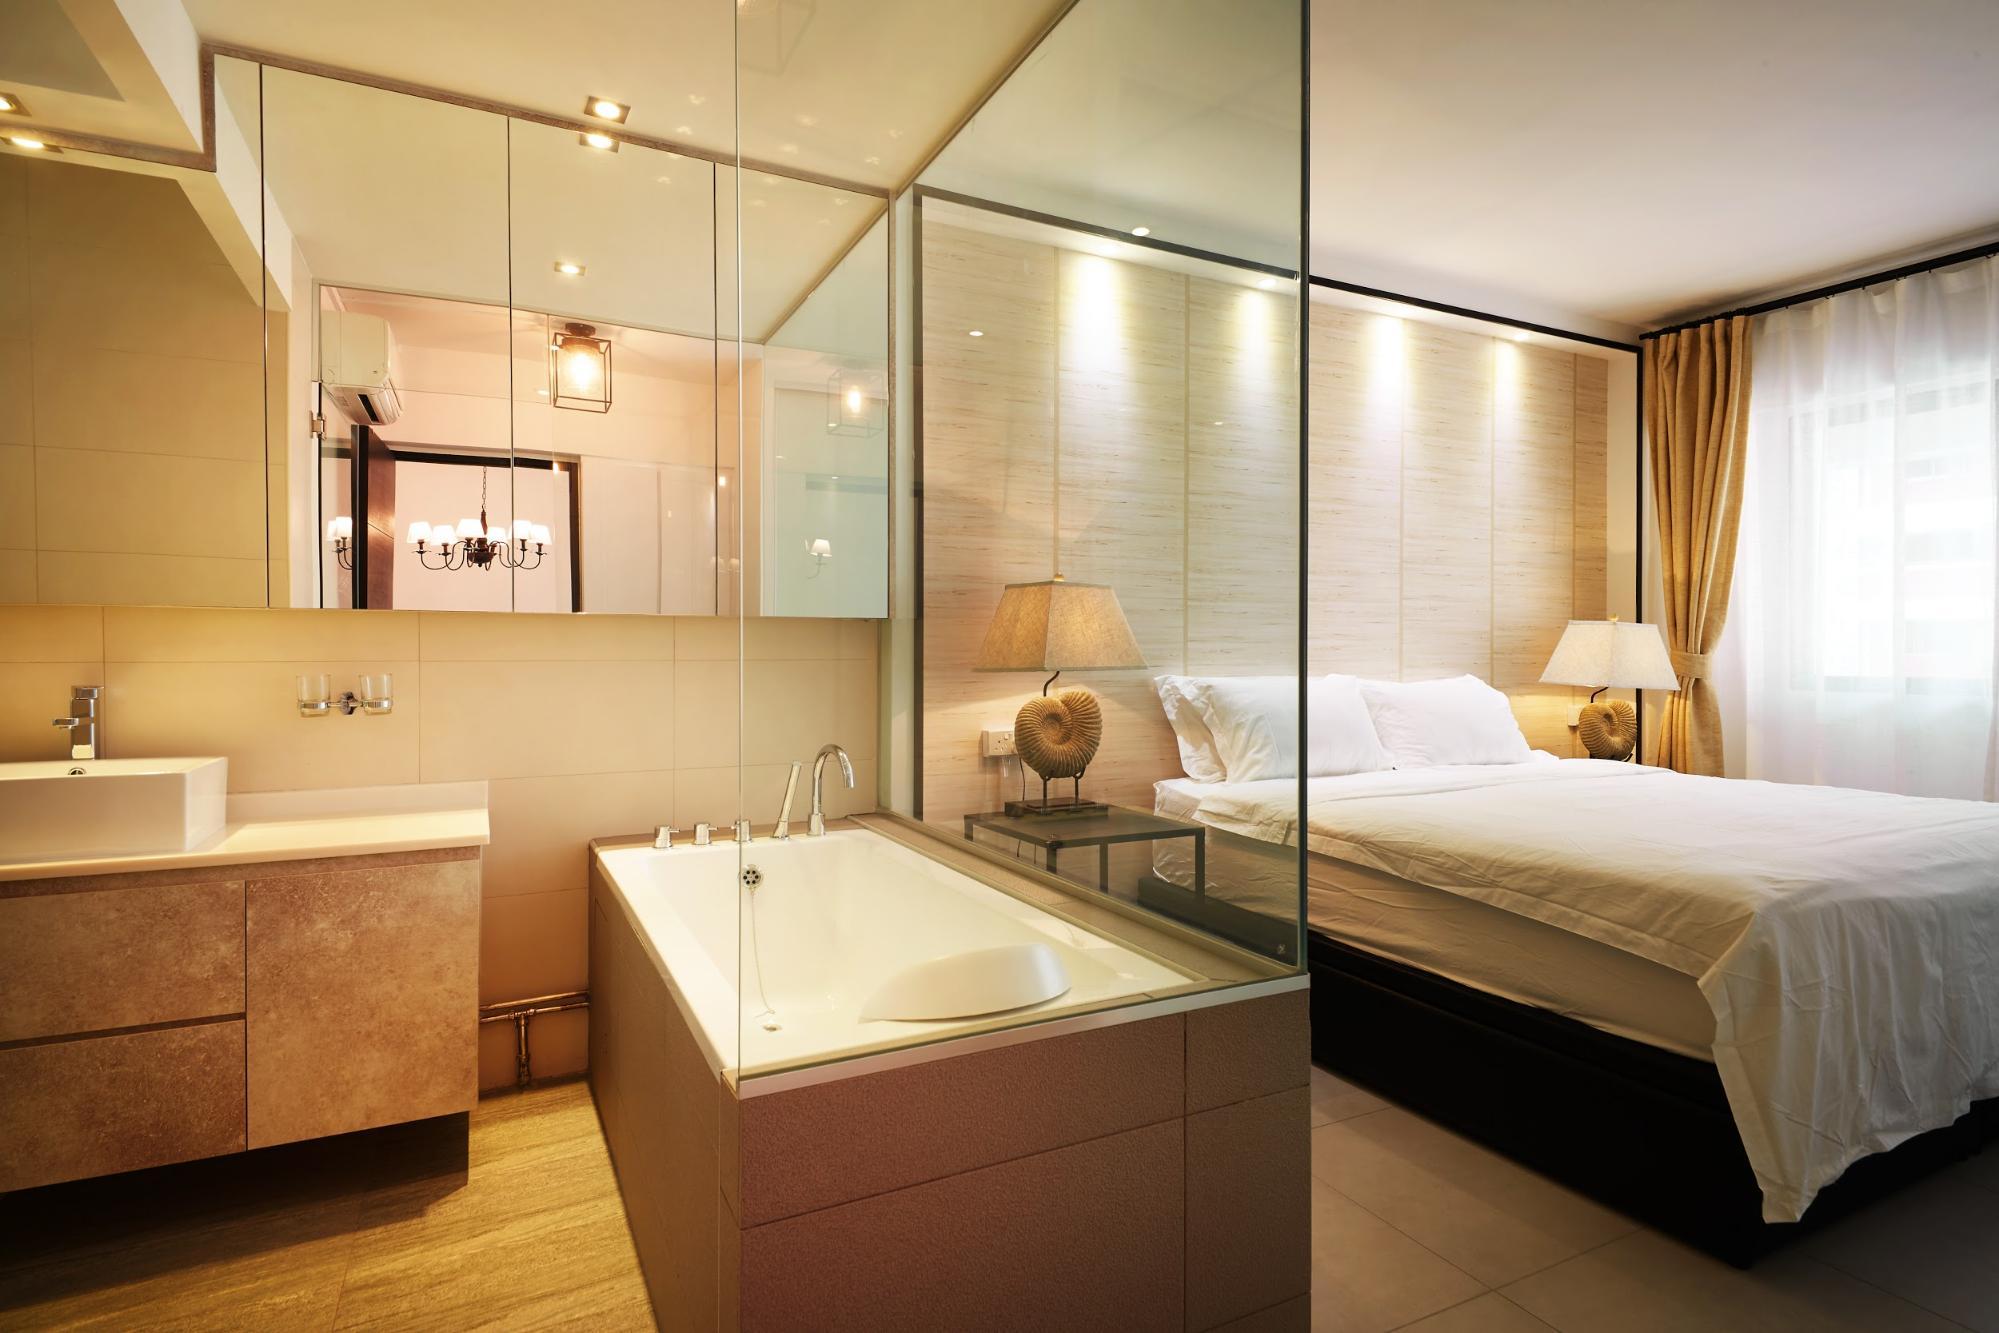 hdb renovation - open concept bathroom